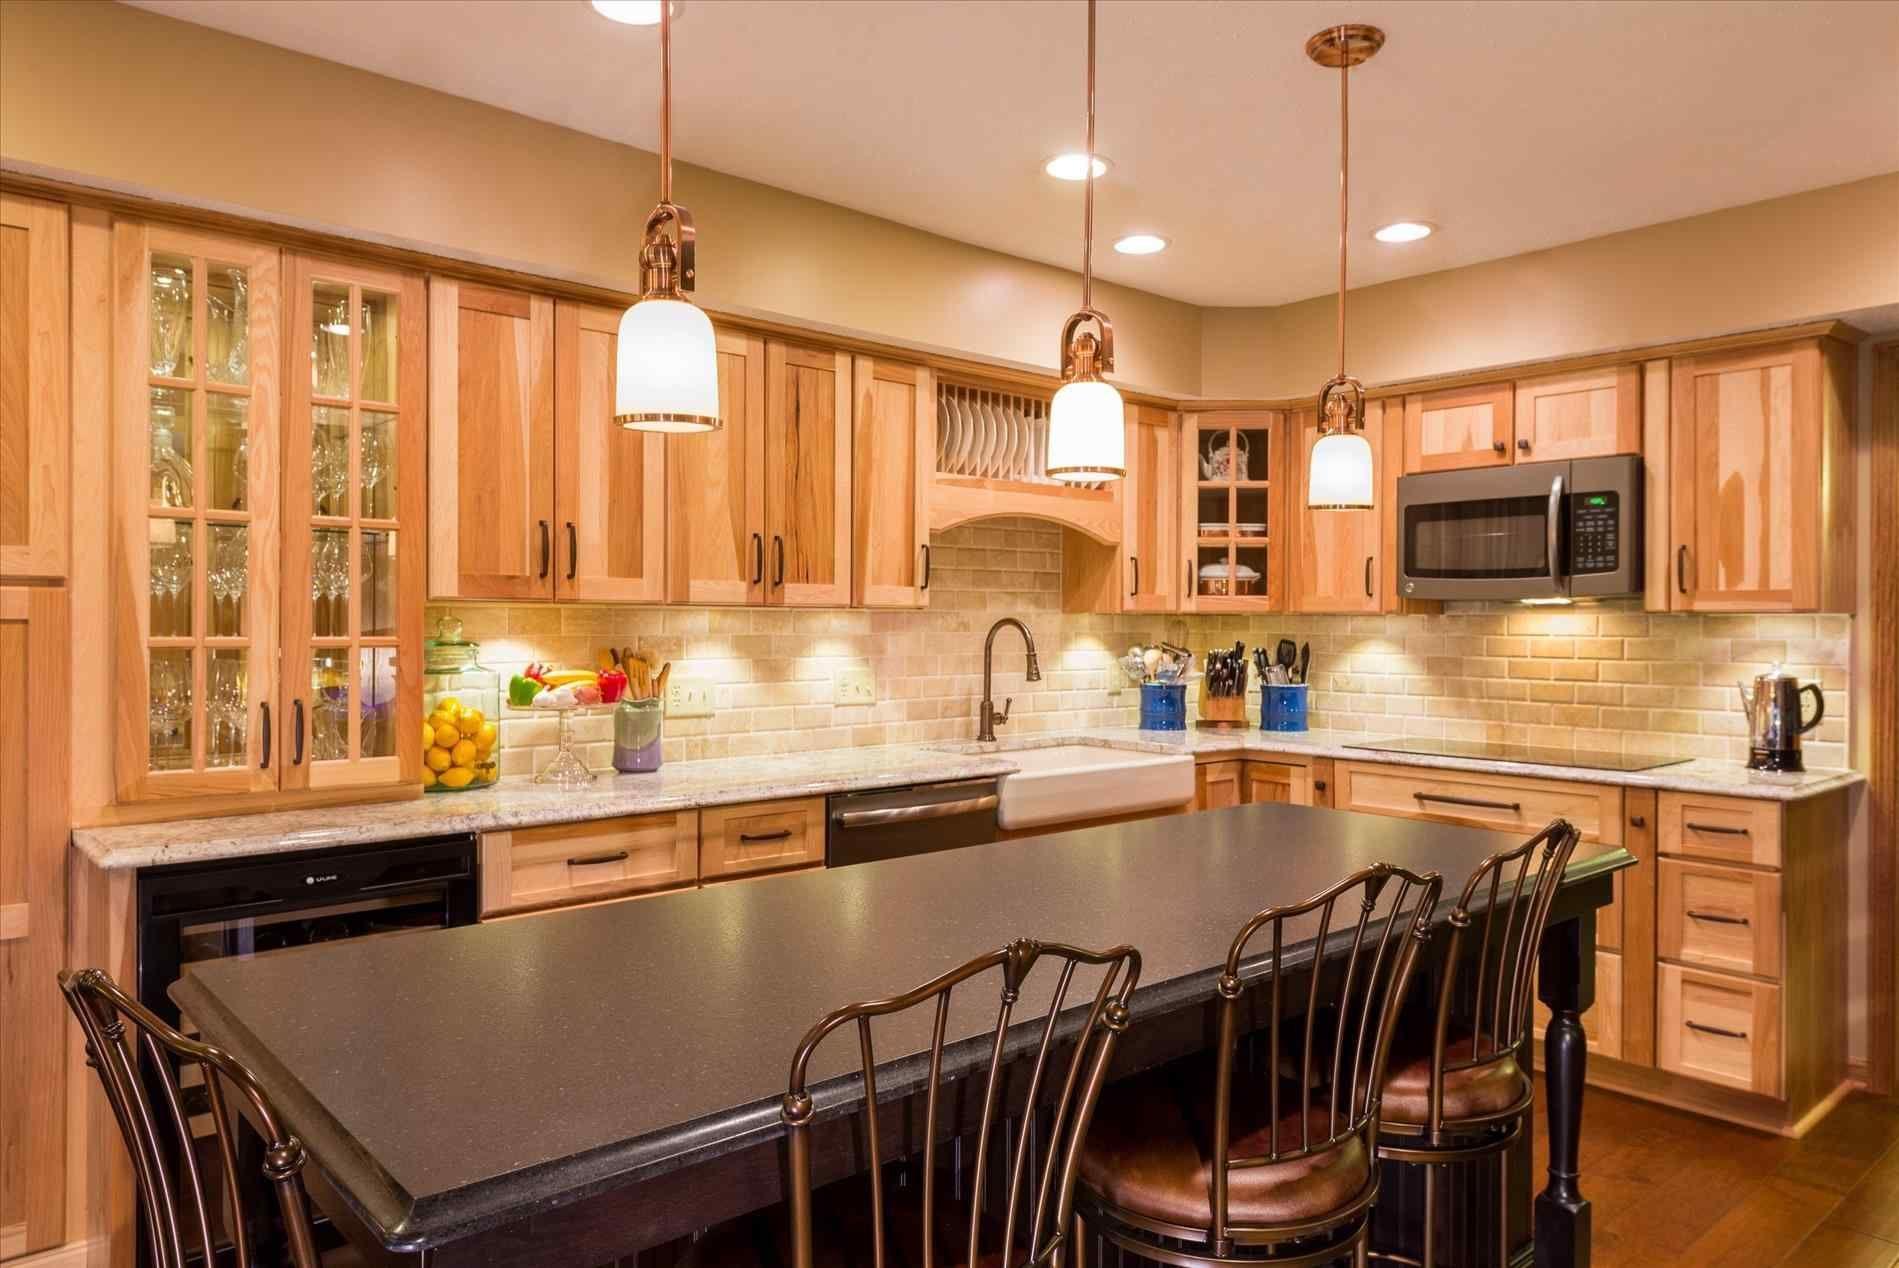 Best modern kitchen design ideas for kitchen paint colors